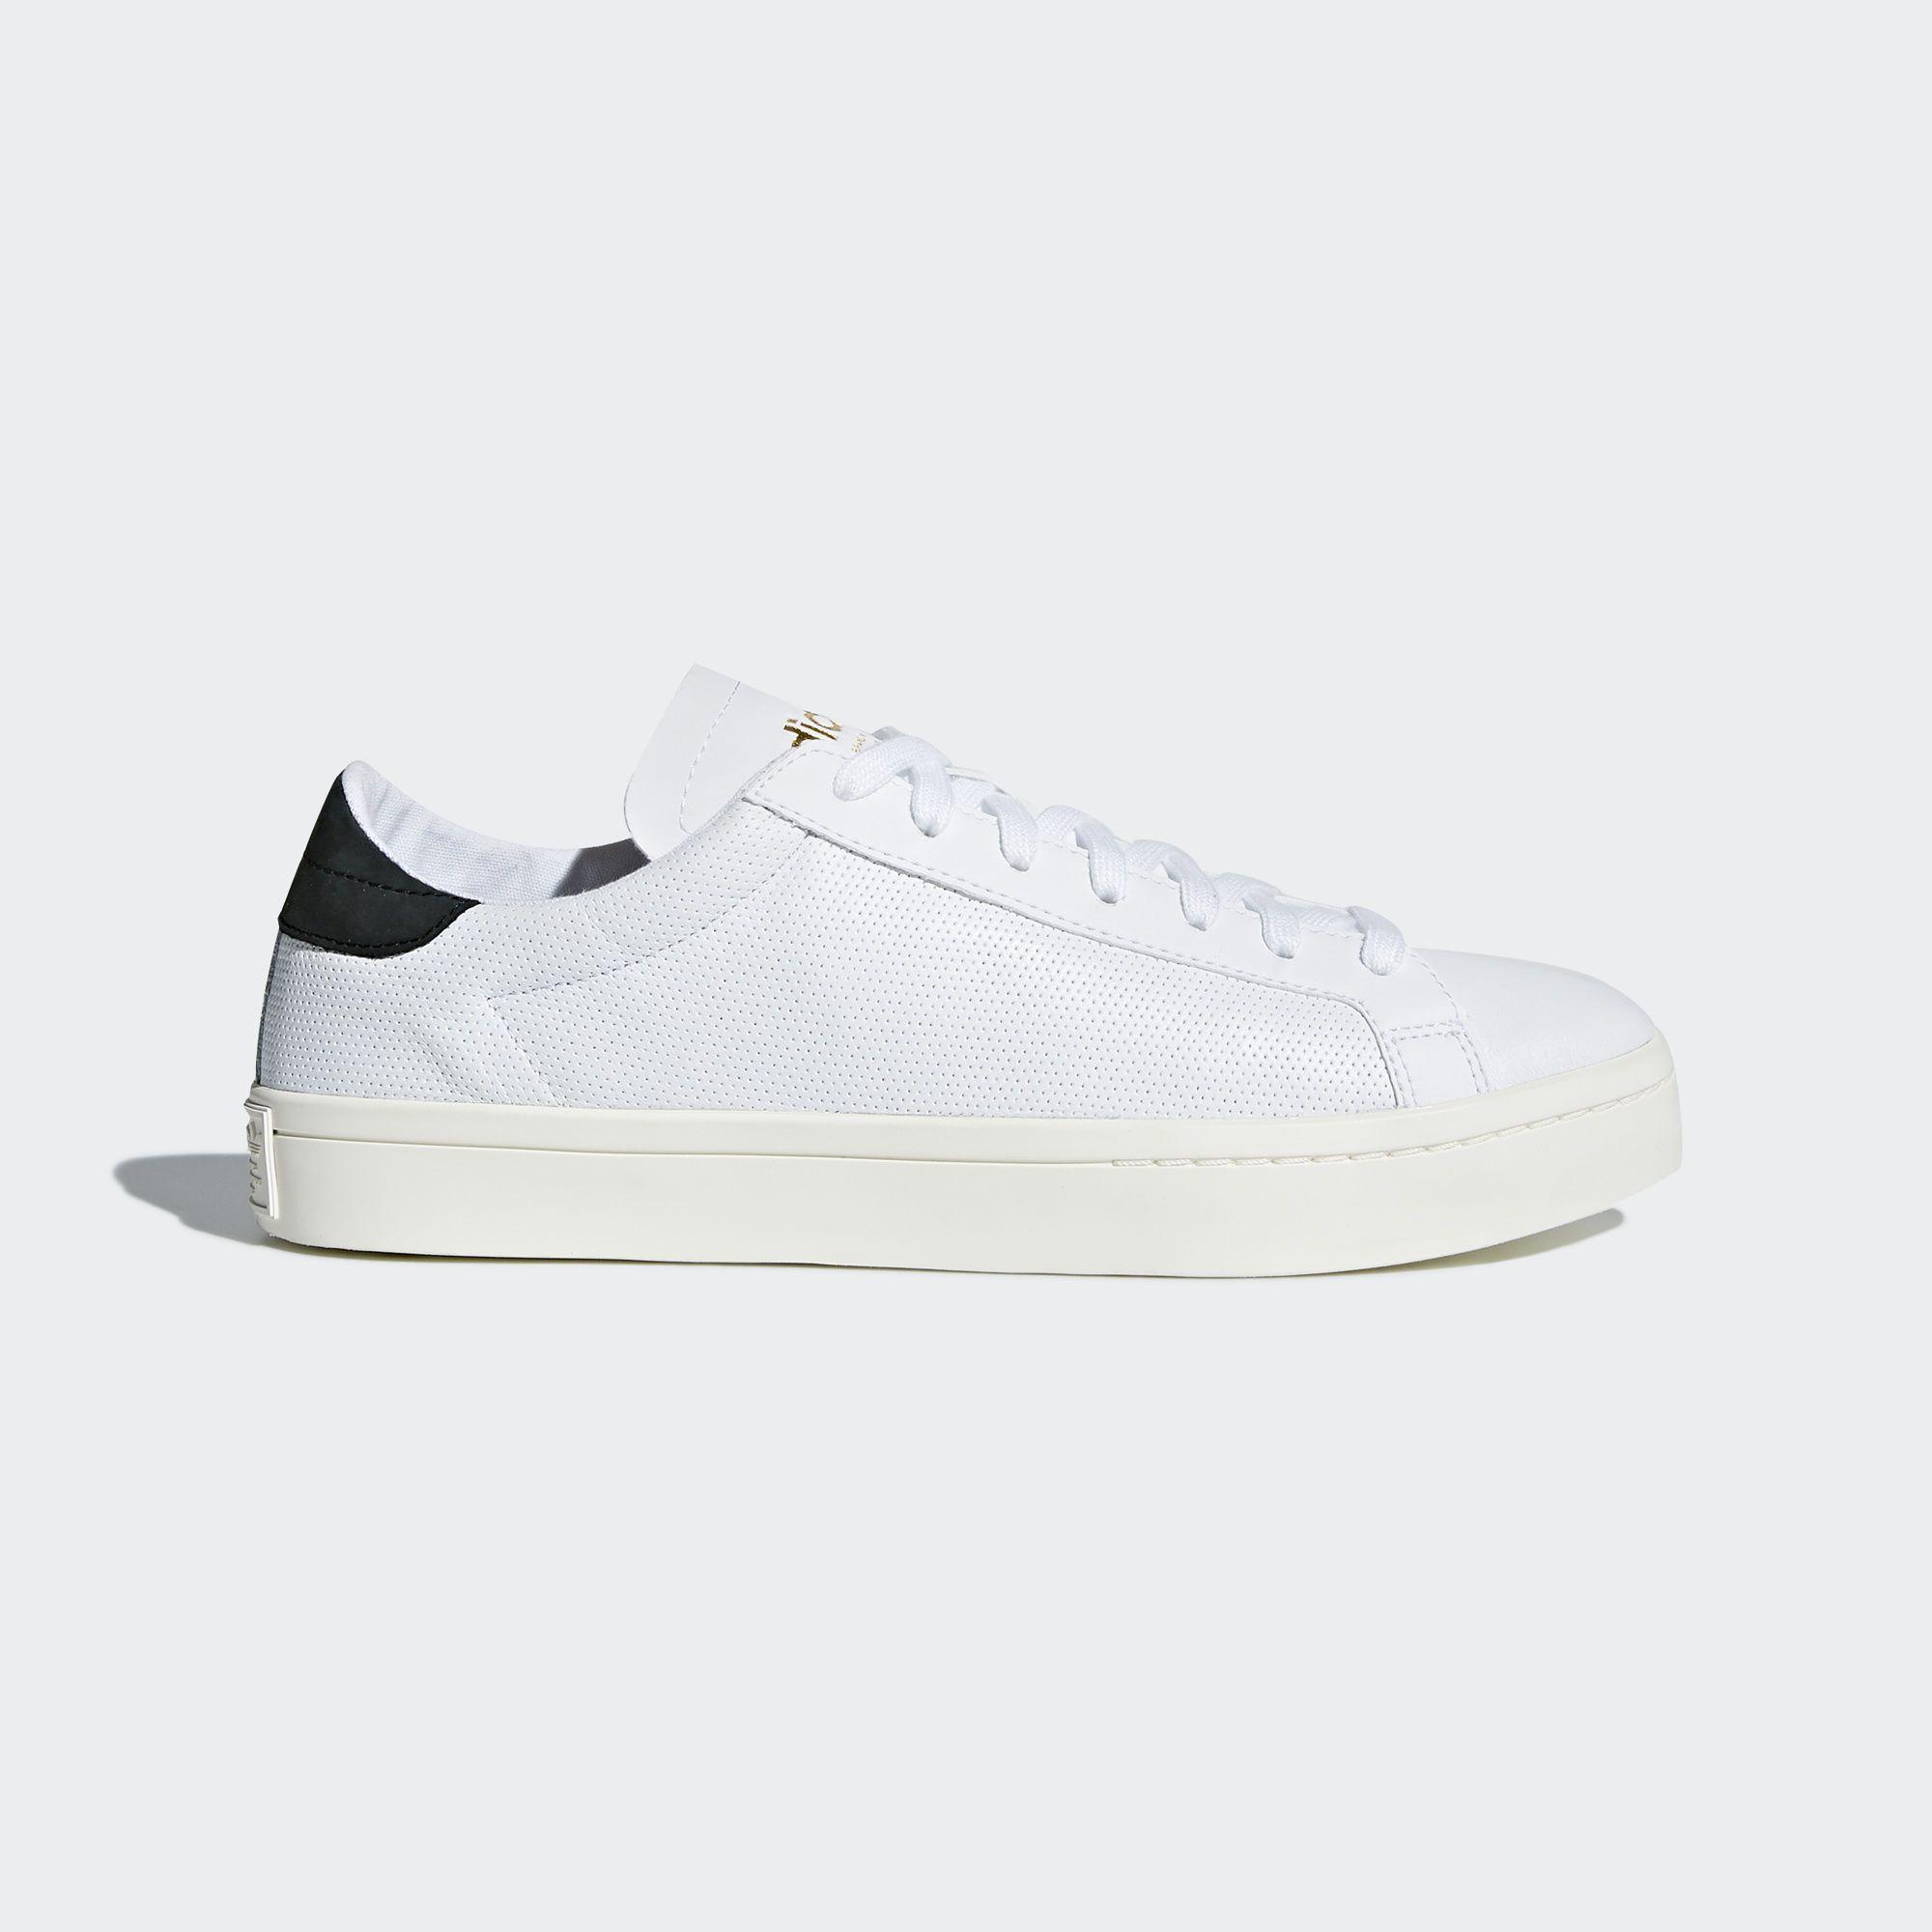 adidas corte vantage scarpe mens scarpe unito online, adidas e calzature